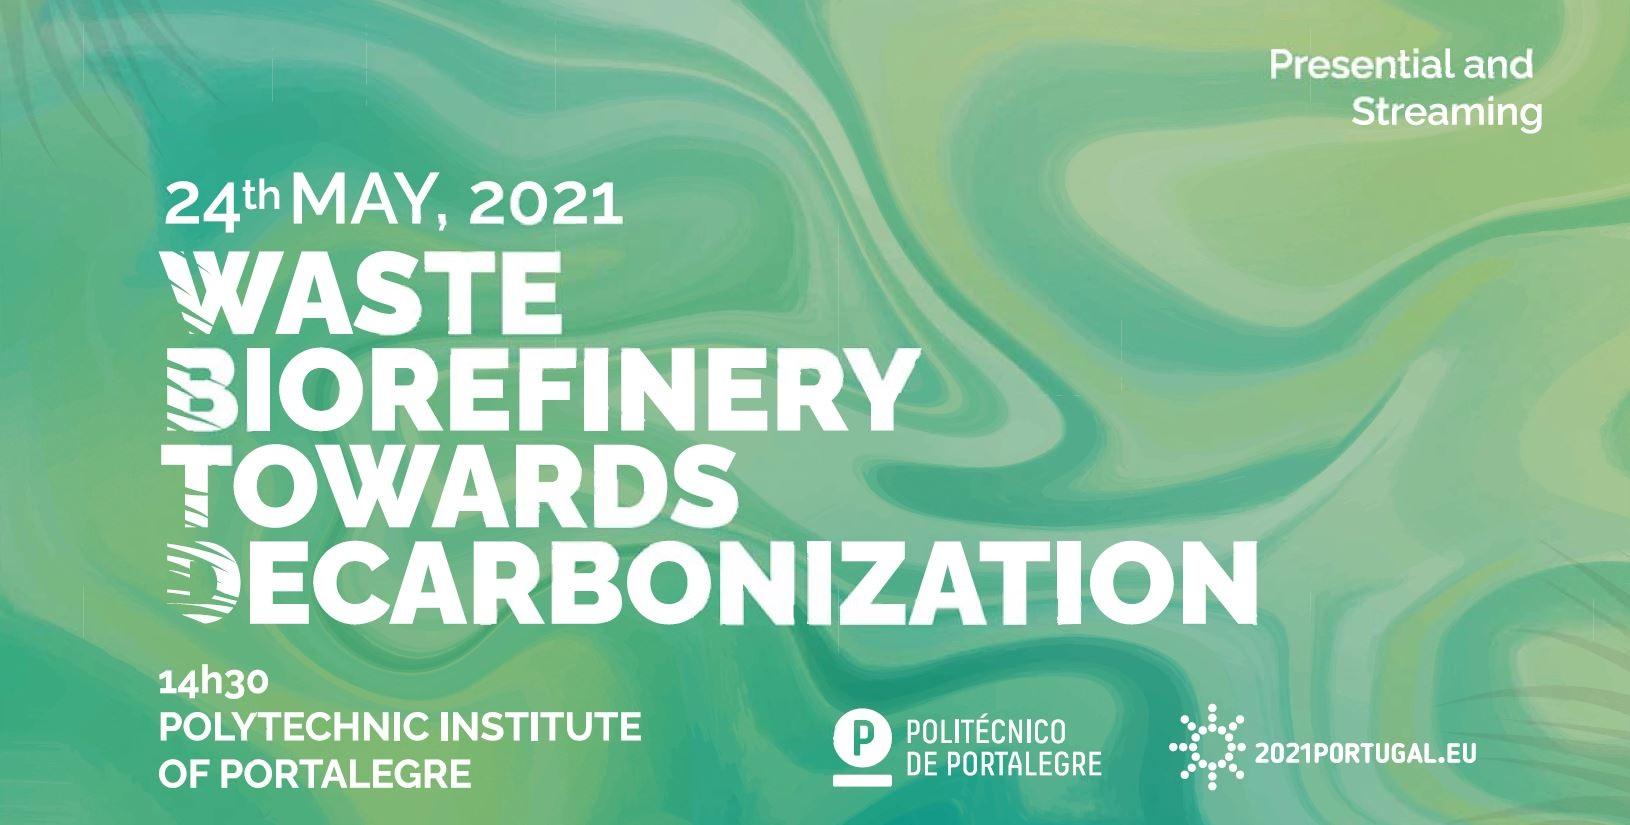 waste-biorefinery-towards-decarbonization